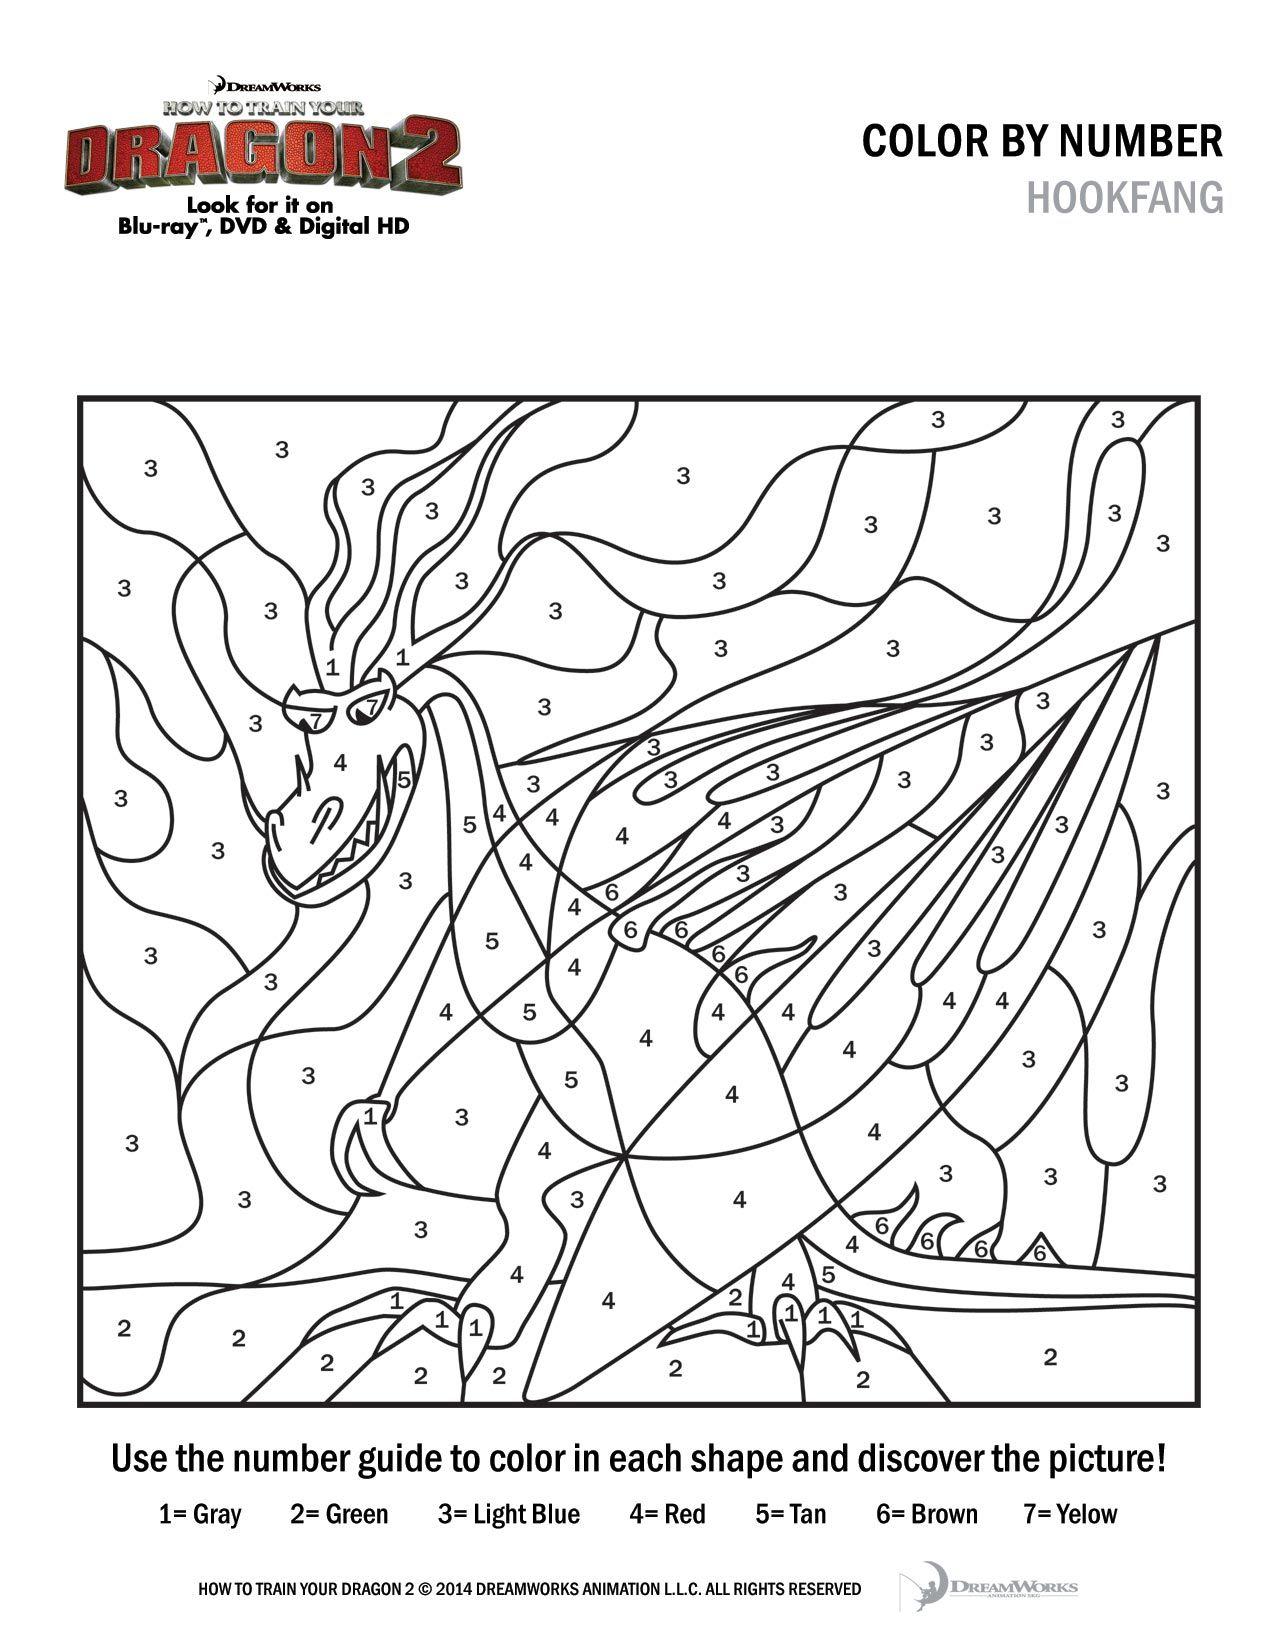 Howtotrainyourdragon2 Downloads Colorbynumber Hookfang Jpg 1275 1650 Malen Nach Zahlen Kinder Drachen Ausmalbilder